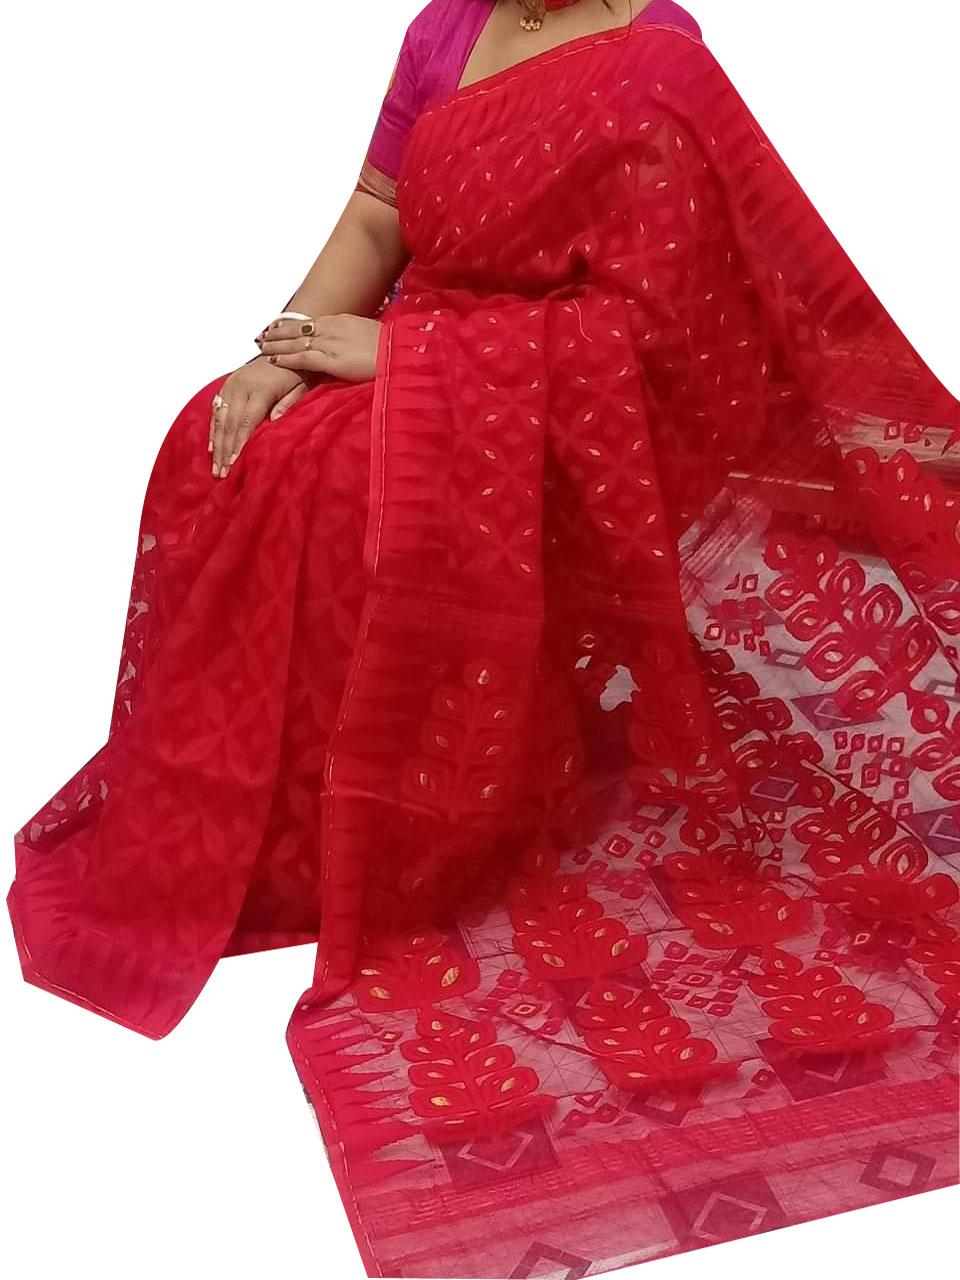 Red dhakai jamdani high quality saree